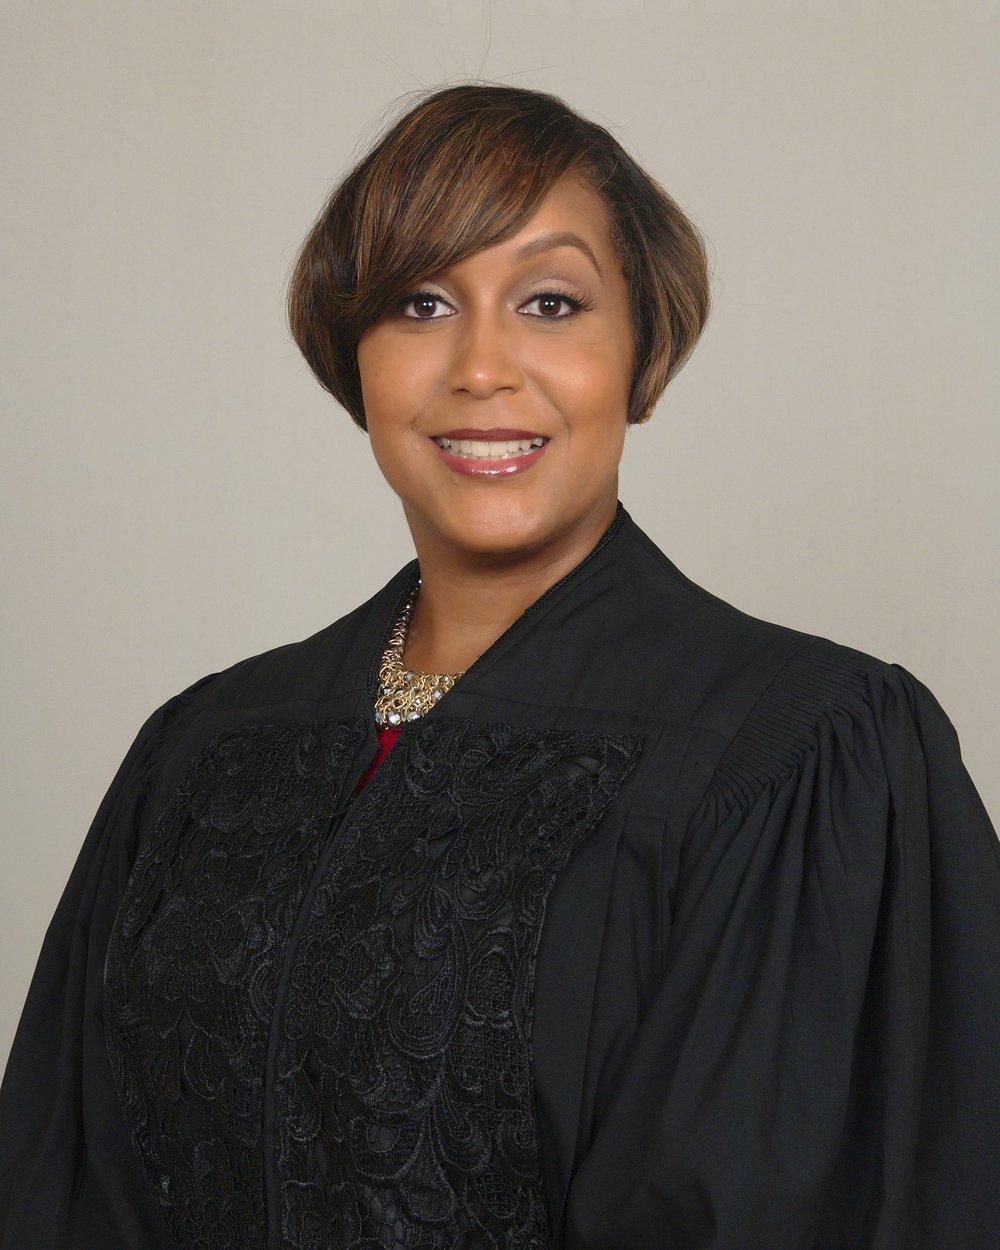 Professional Head Shot - Judicial Robe.jpg